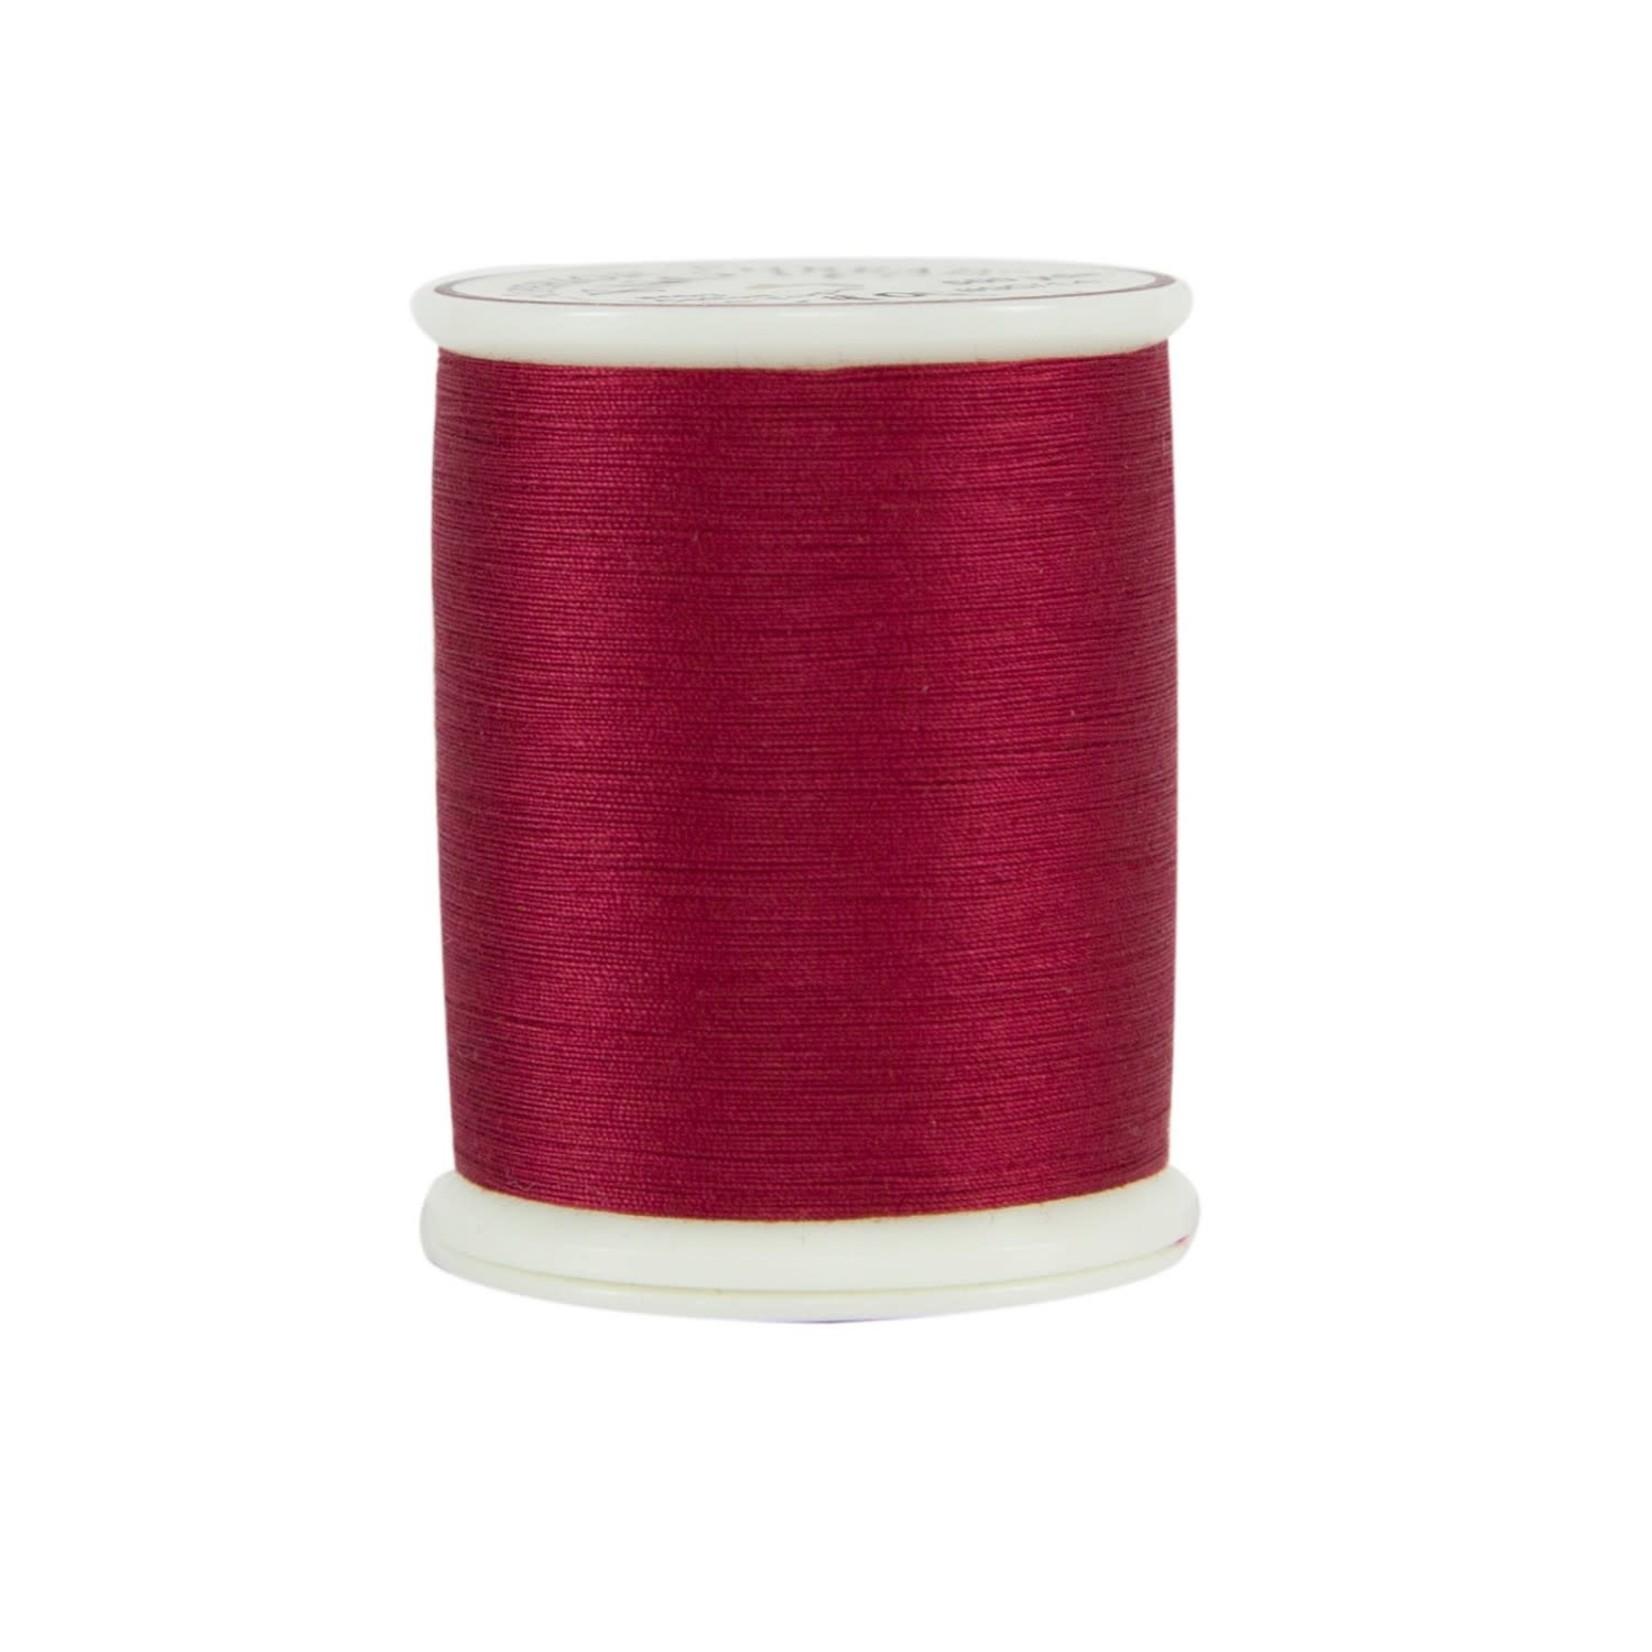 Superior Threads King Tut - #40 - 457 m - 1000 Romy Red